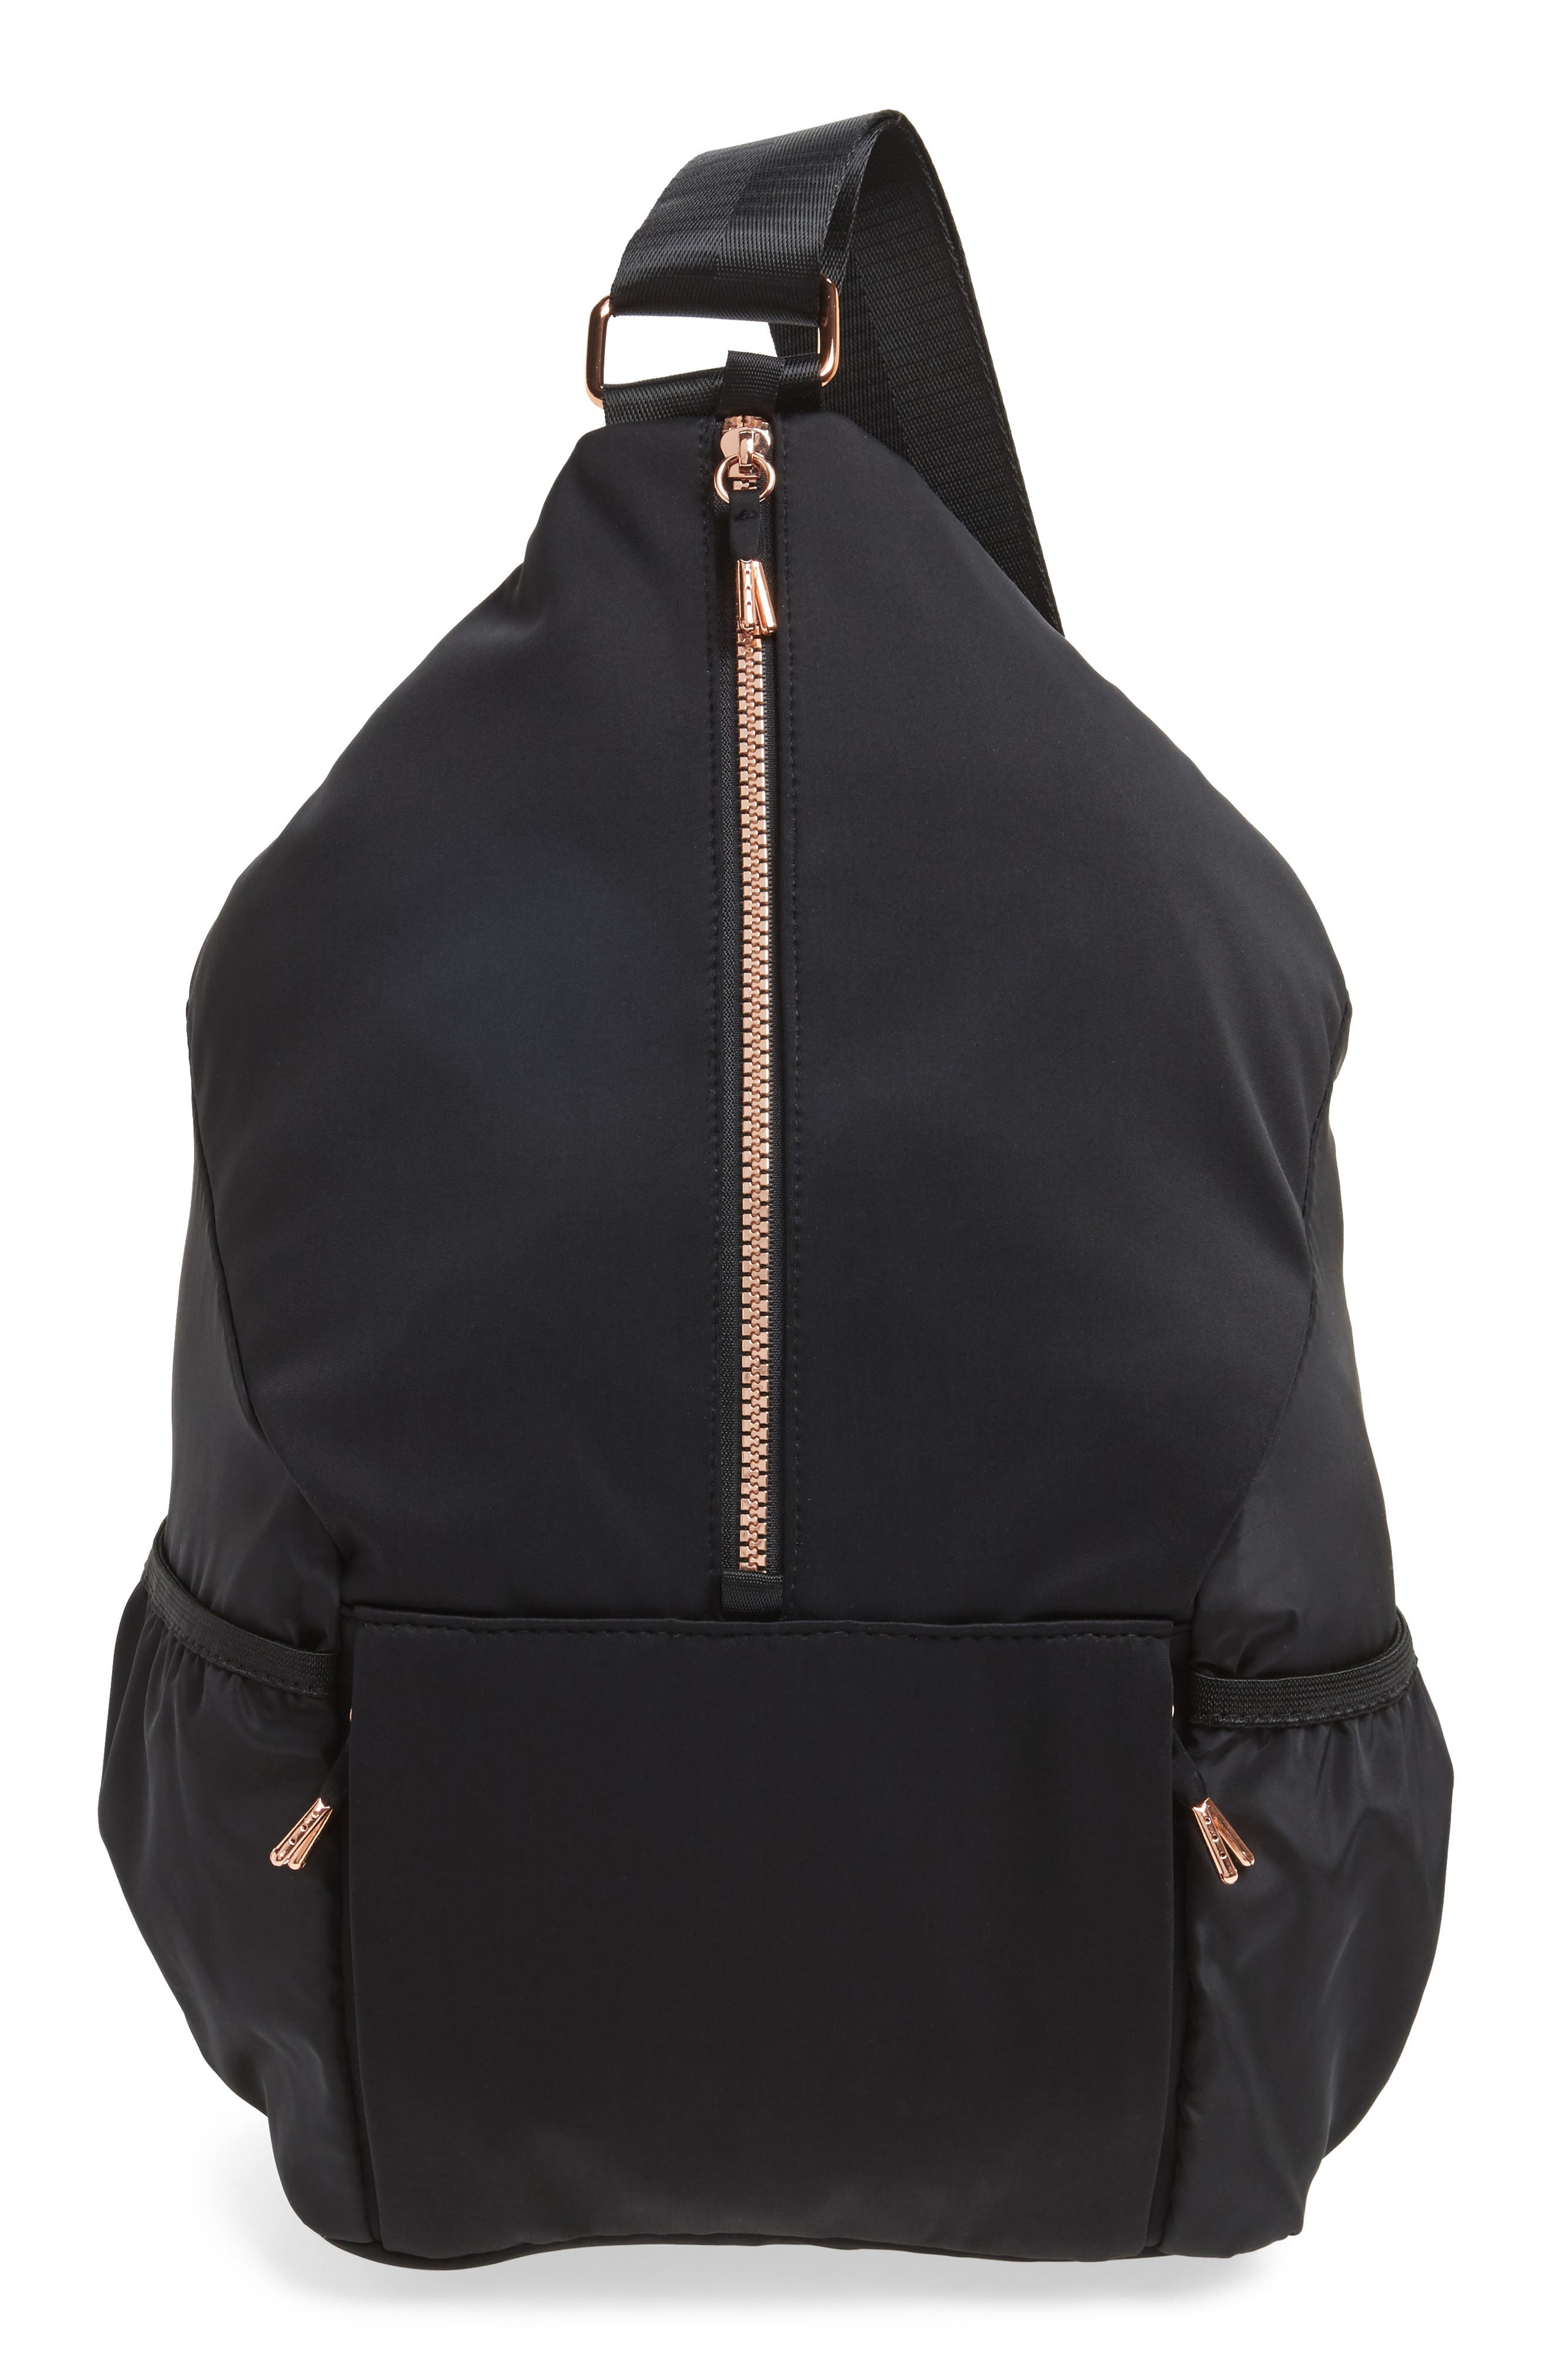 Studio Sling Backpack,                             Main thumbnail 1, color,                             001